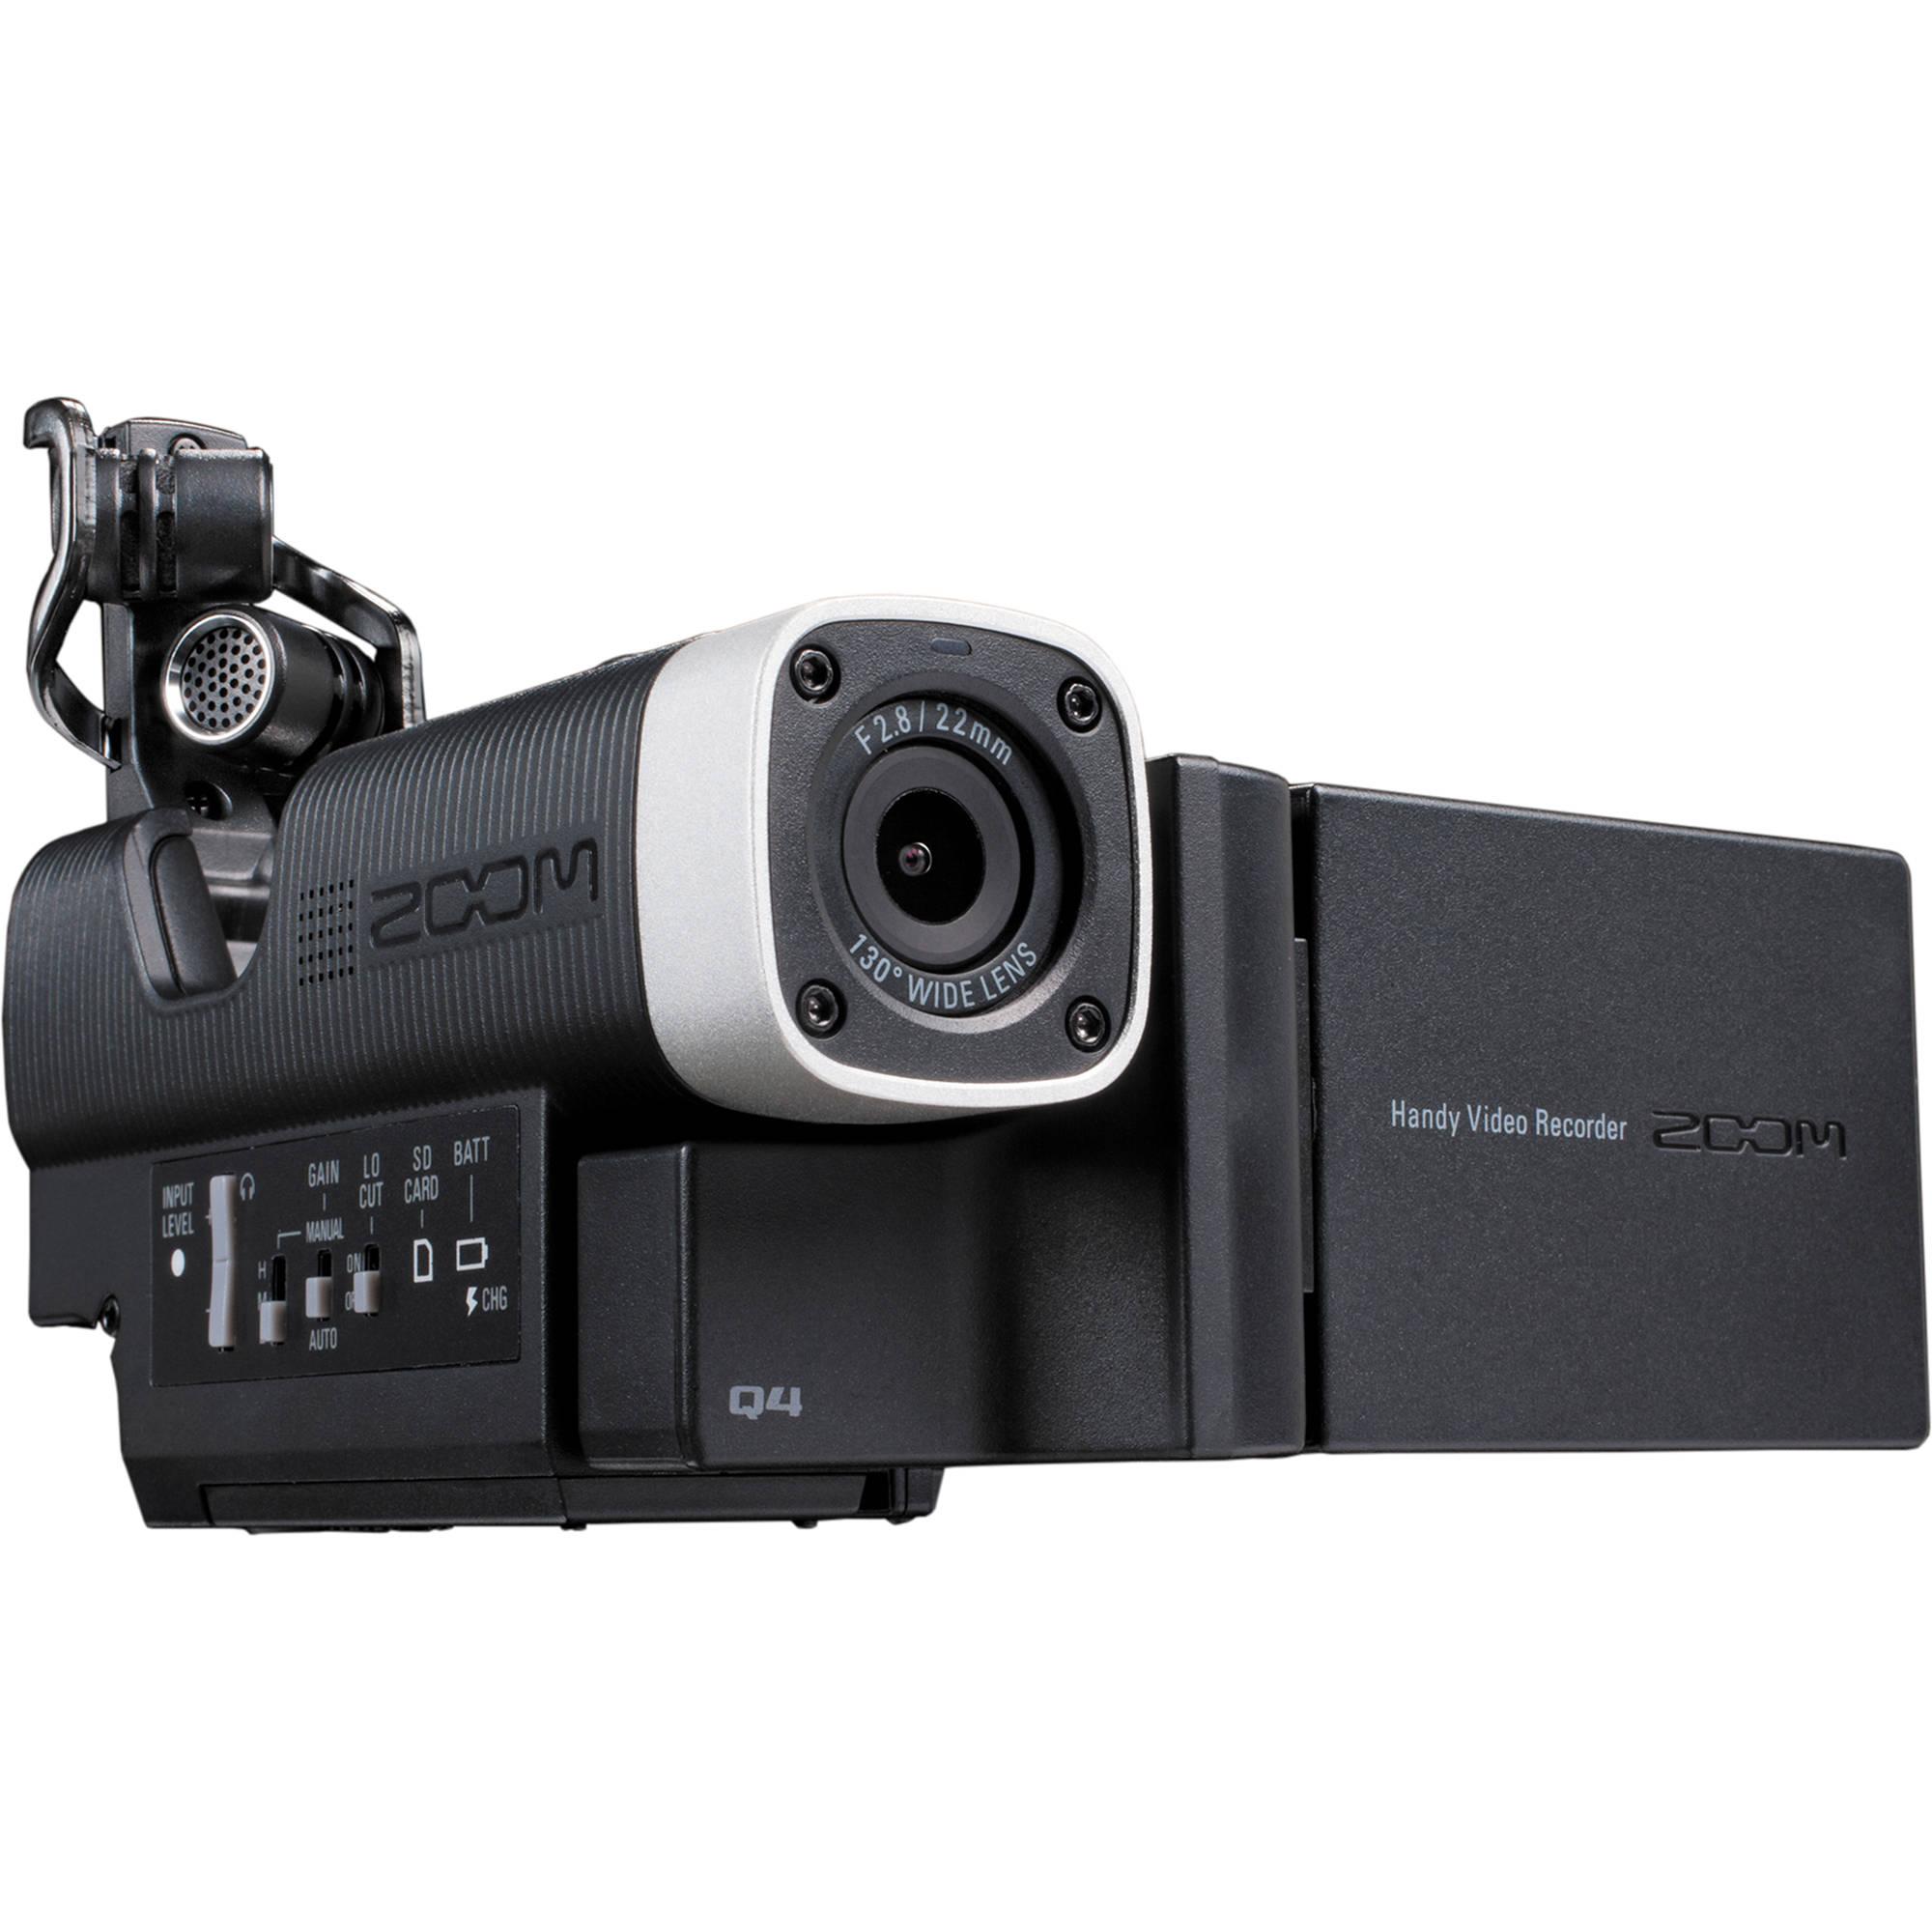 ZOOM Q4 Handy Video Recorder $129.99 @ B&H Photo w/ Free Shipping